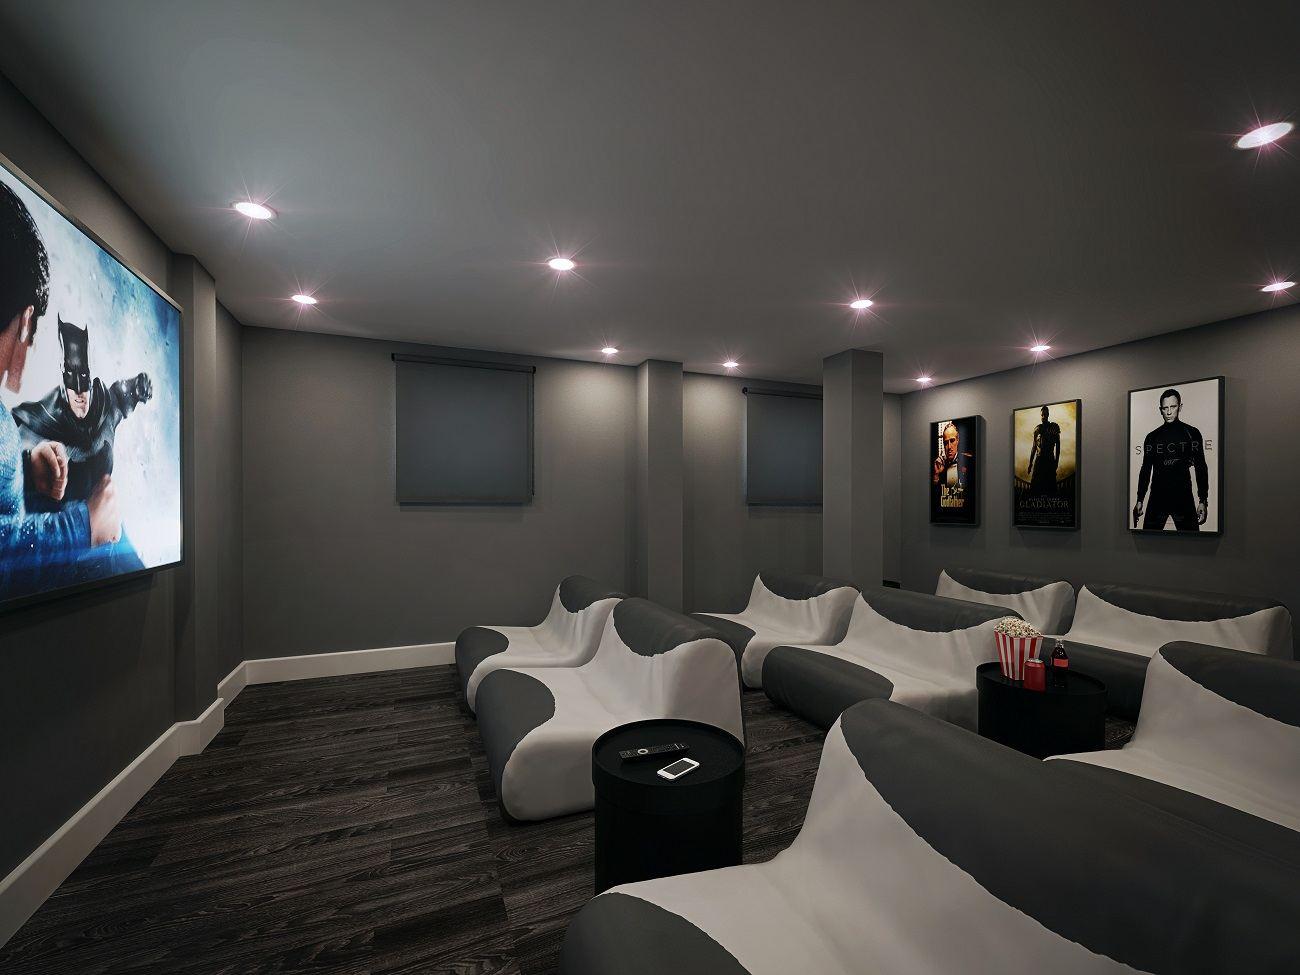 Glendower-House-Cardiff-Cinema-Room-Unilodgers